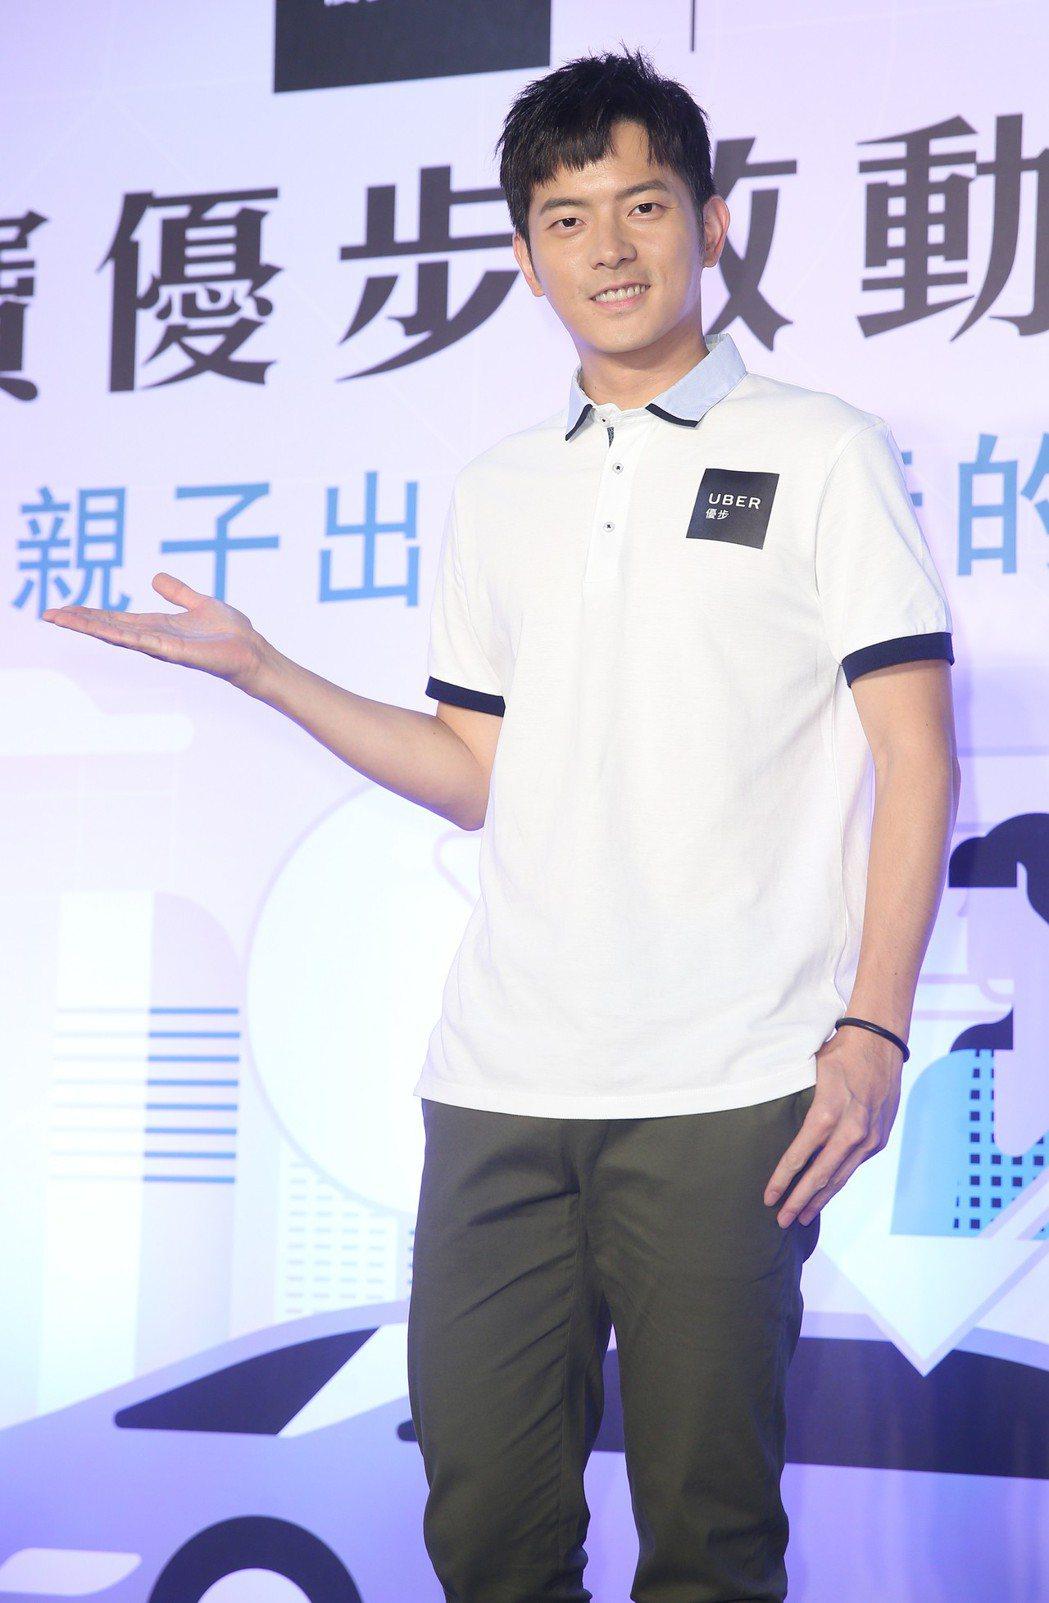 Uber四都推出寶寶優步,藝人宥勝代言。記者陳正興/攝影